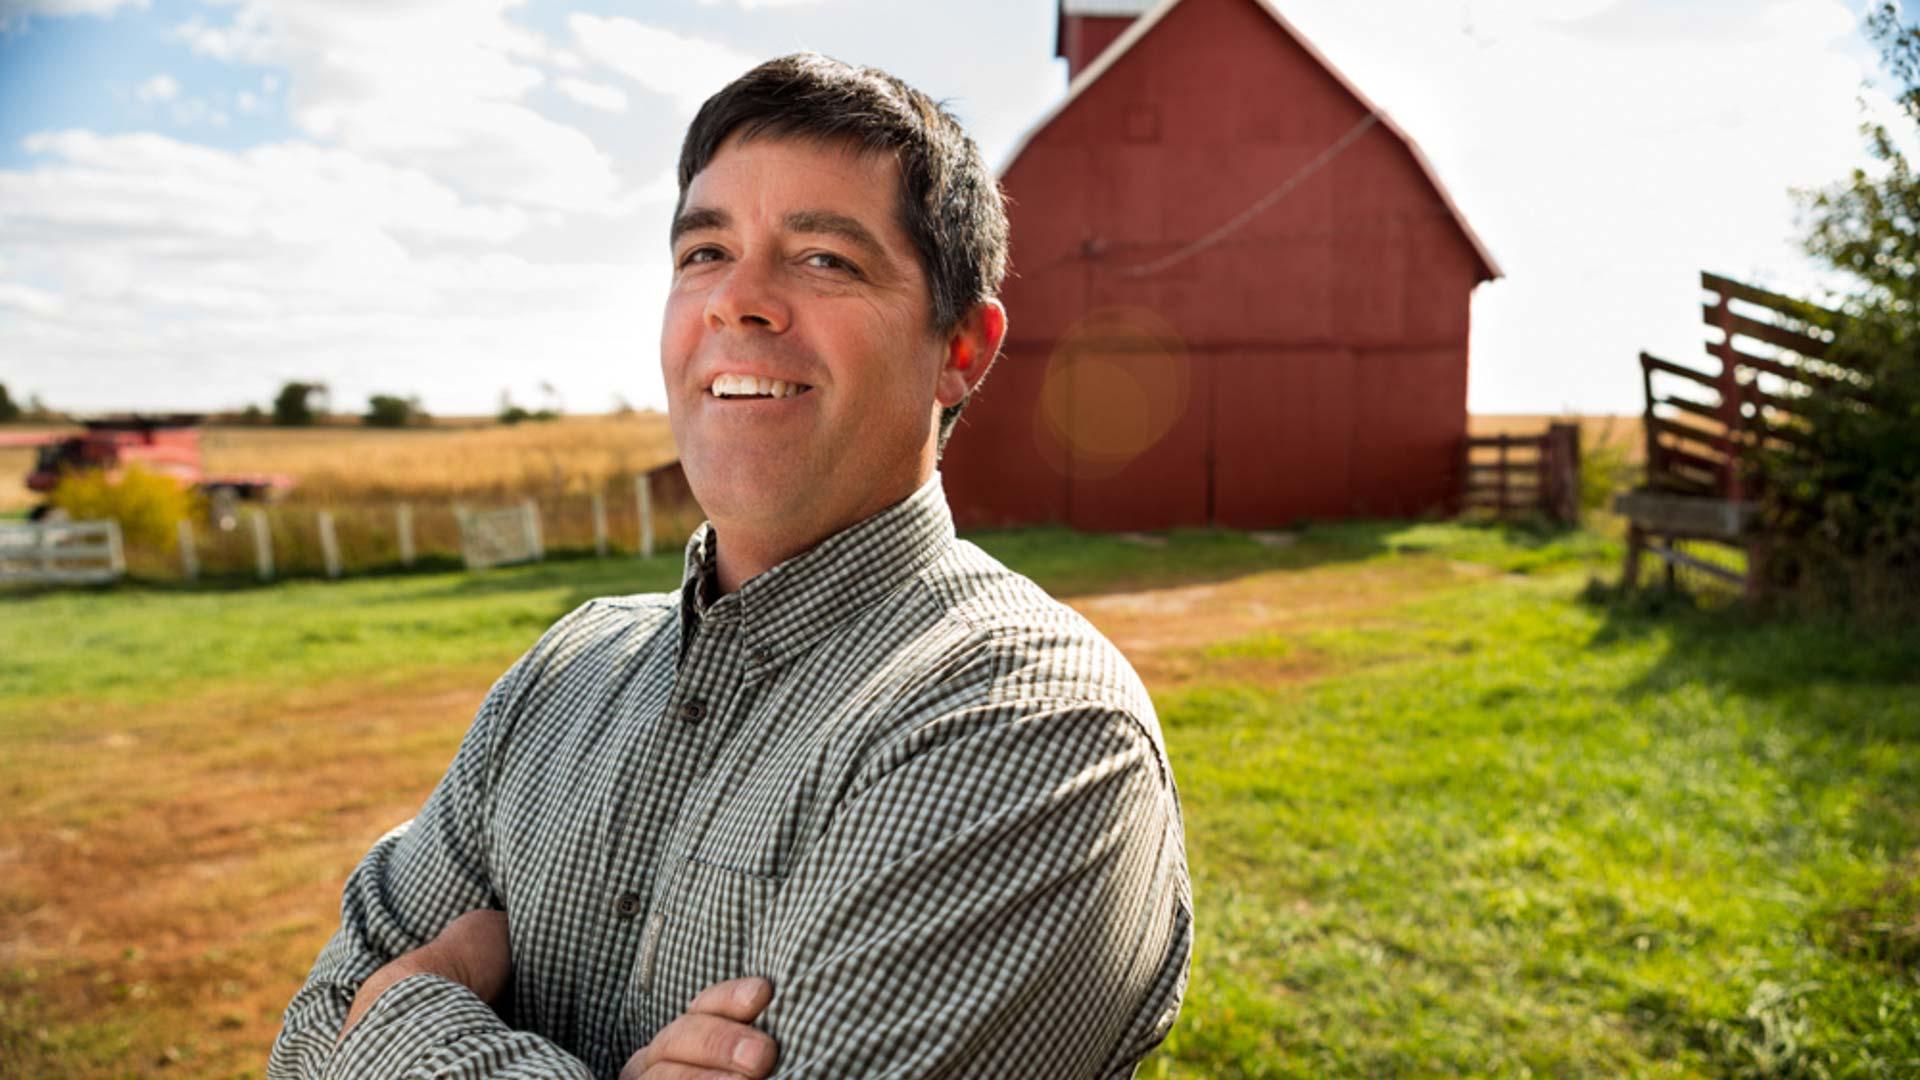 Corn-farmer-field-0030_Web.jpg